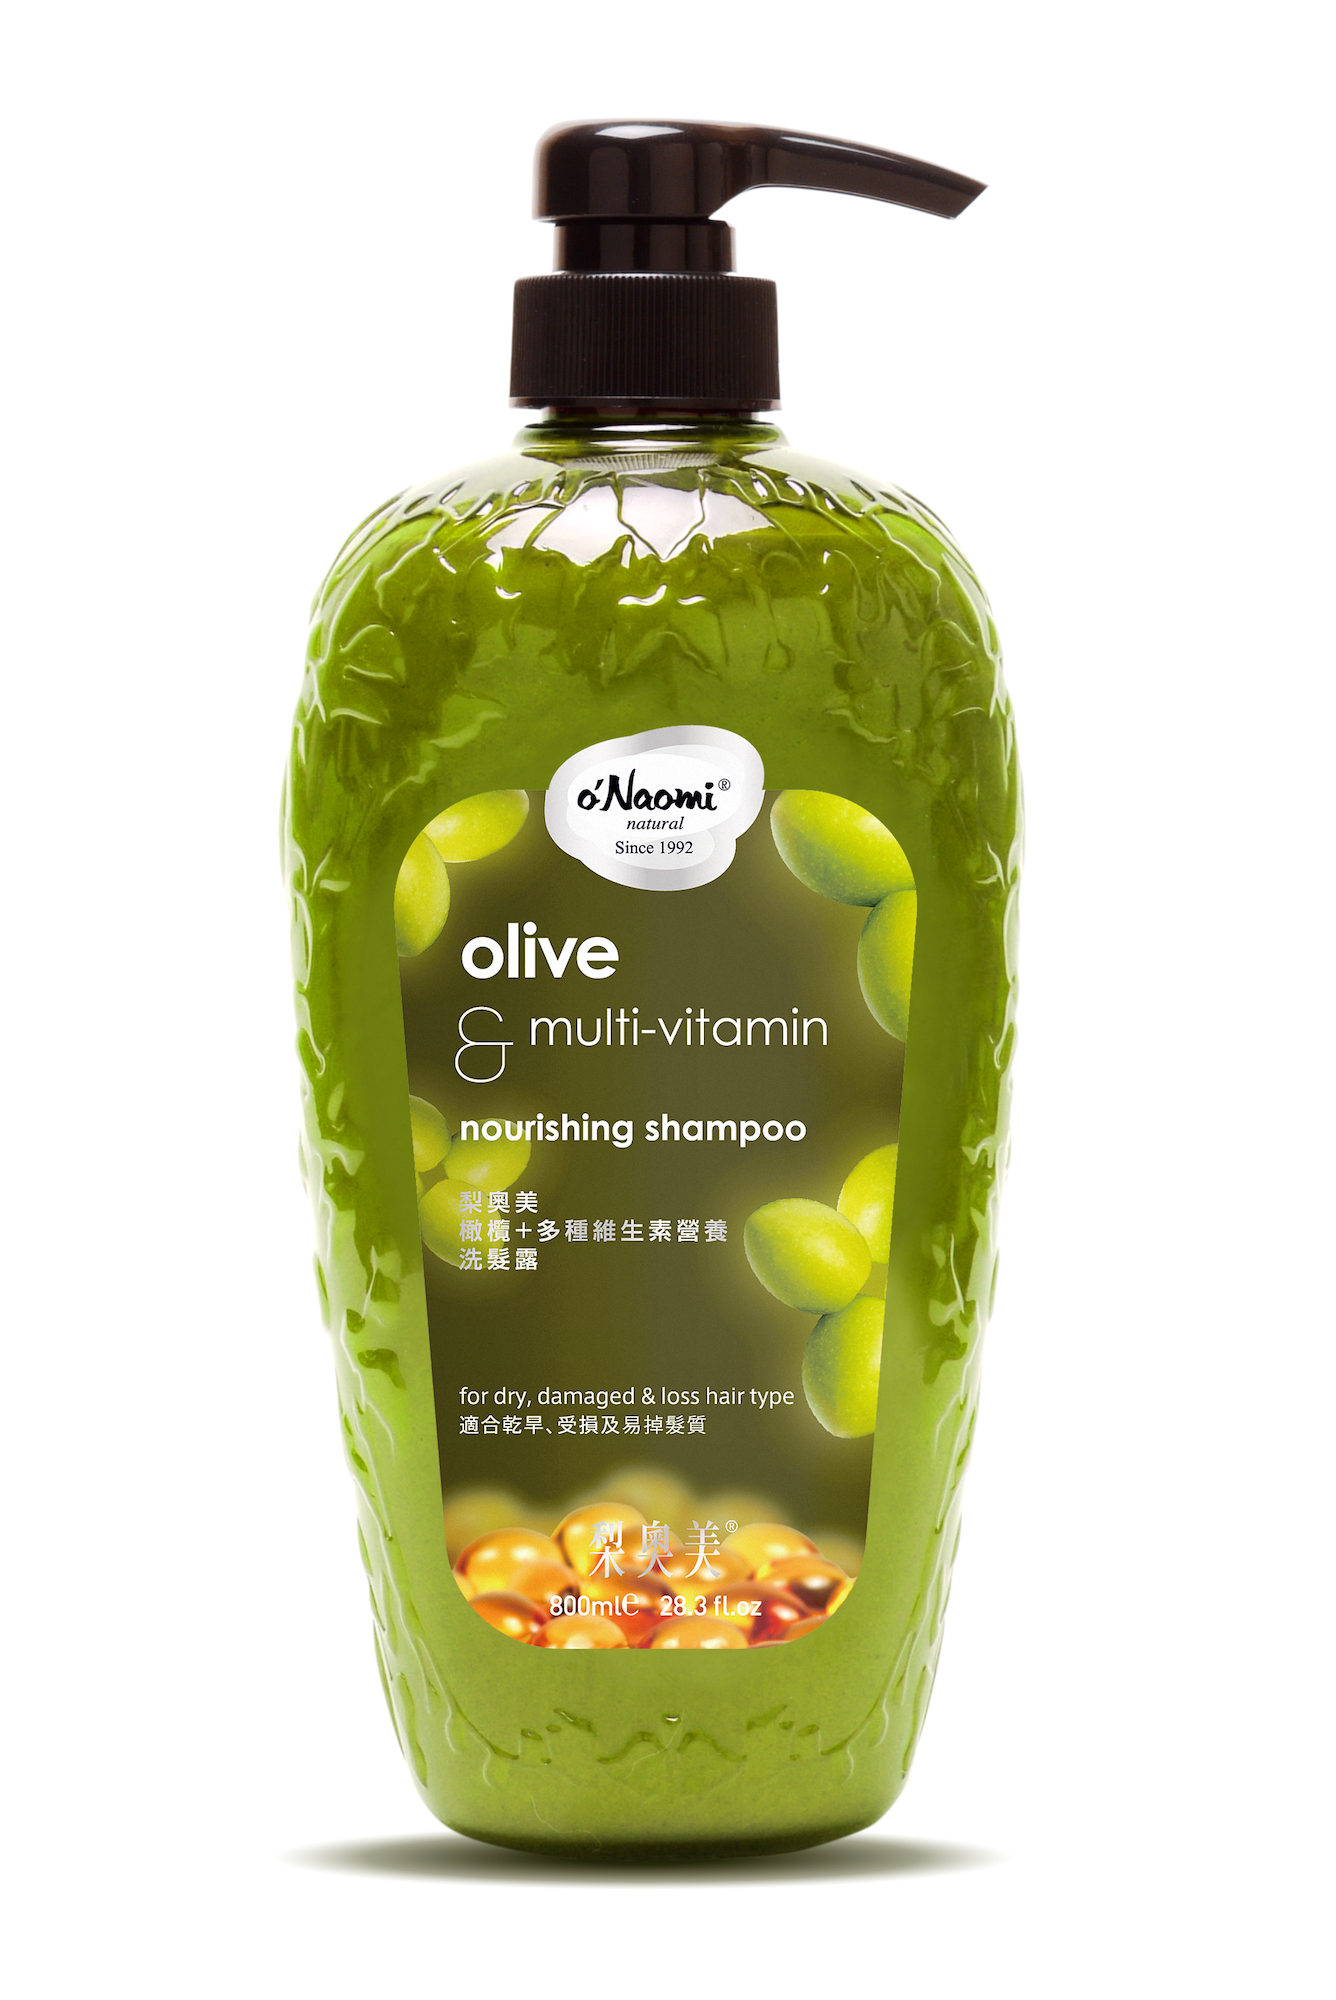 Onaomi Olive Vitamin Shampoo Mockup